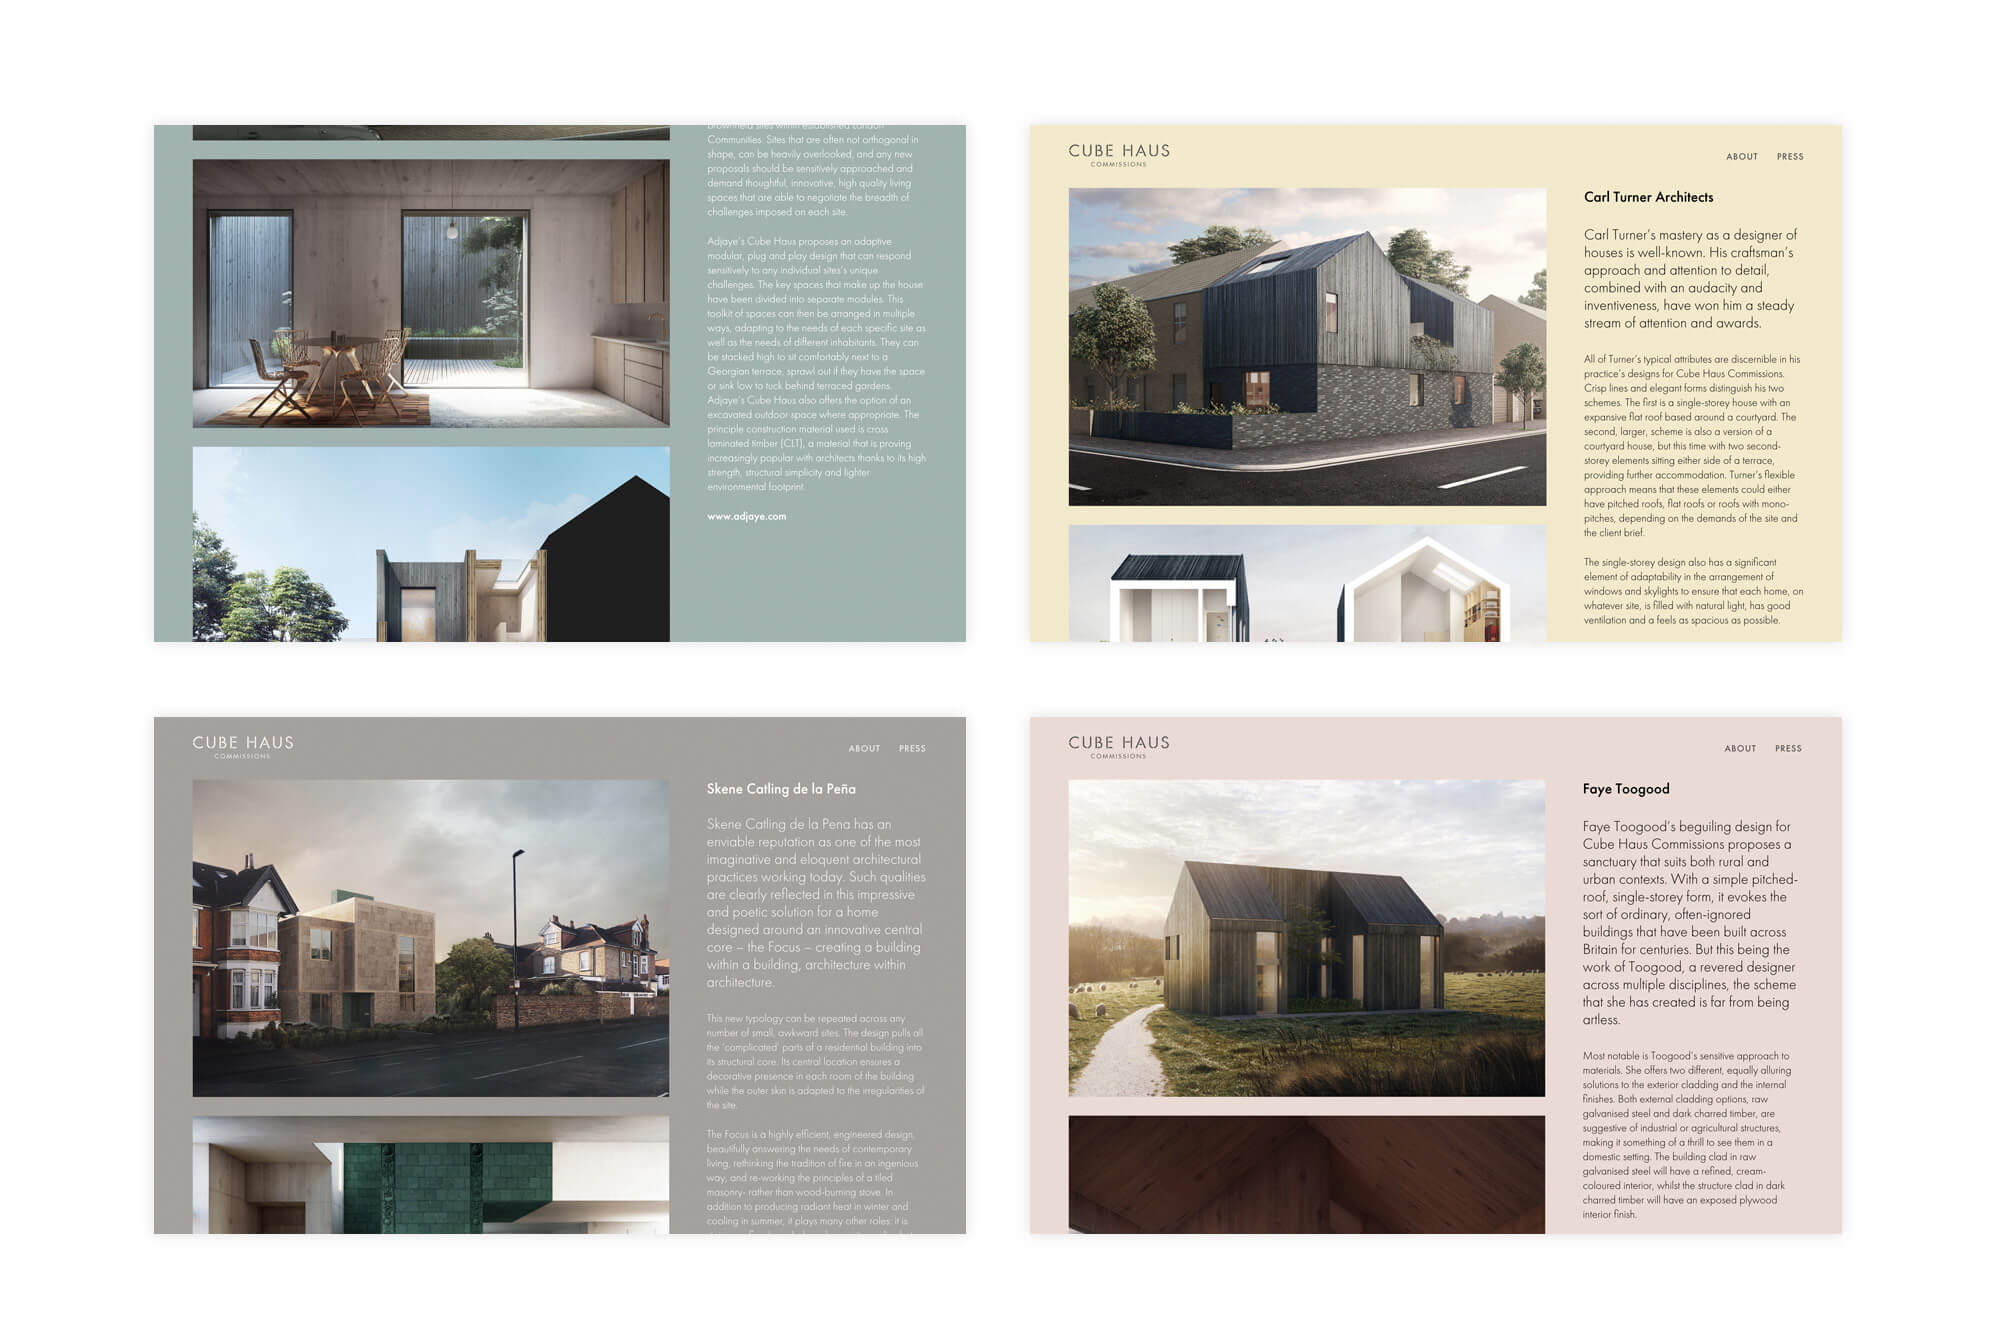 gpj-studio-cube-haus-architects-website-cs-04